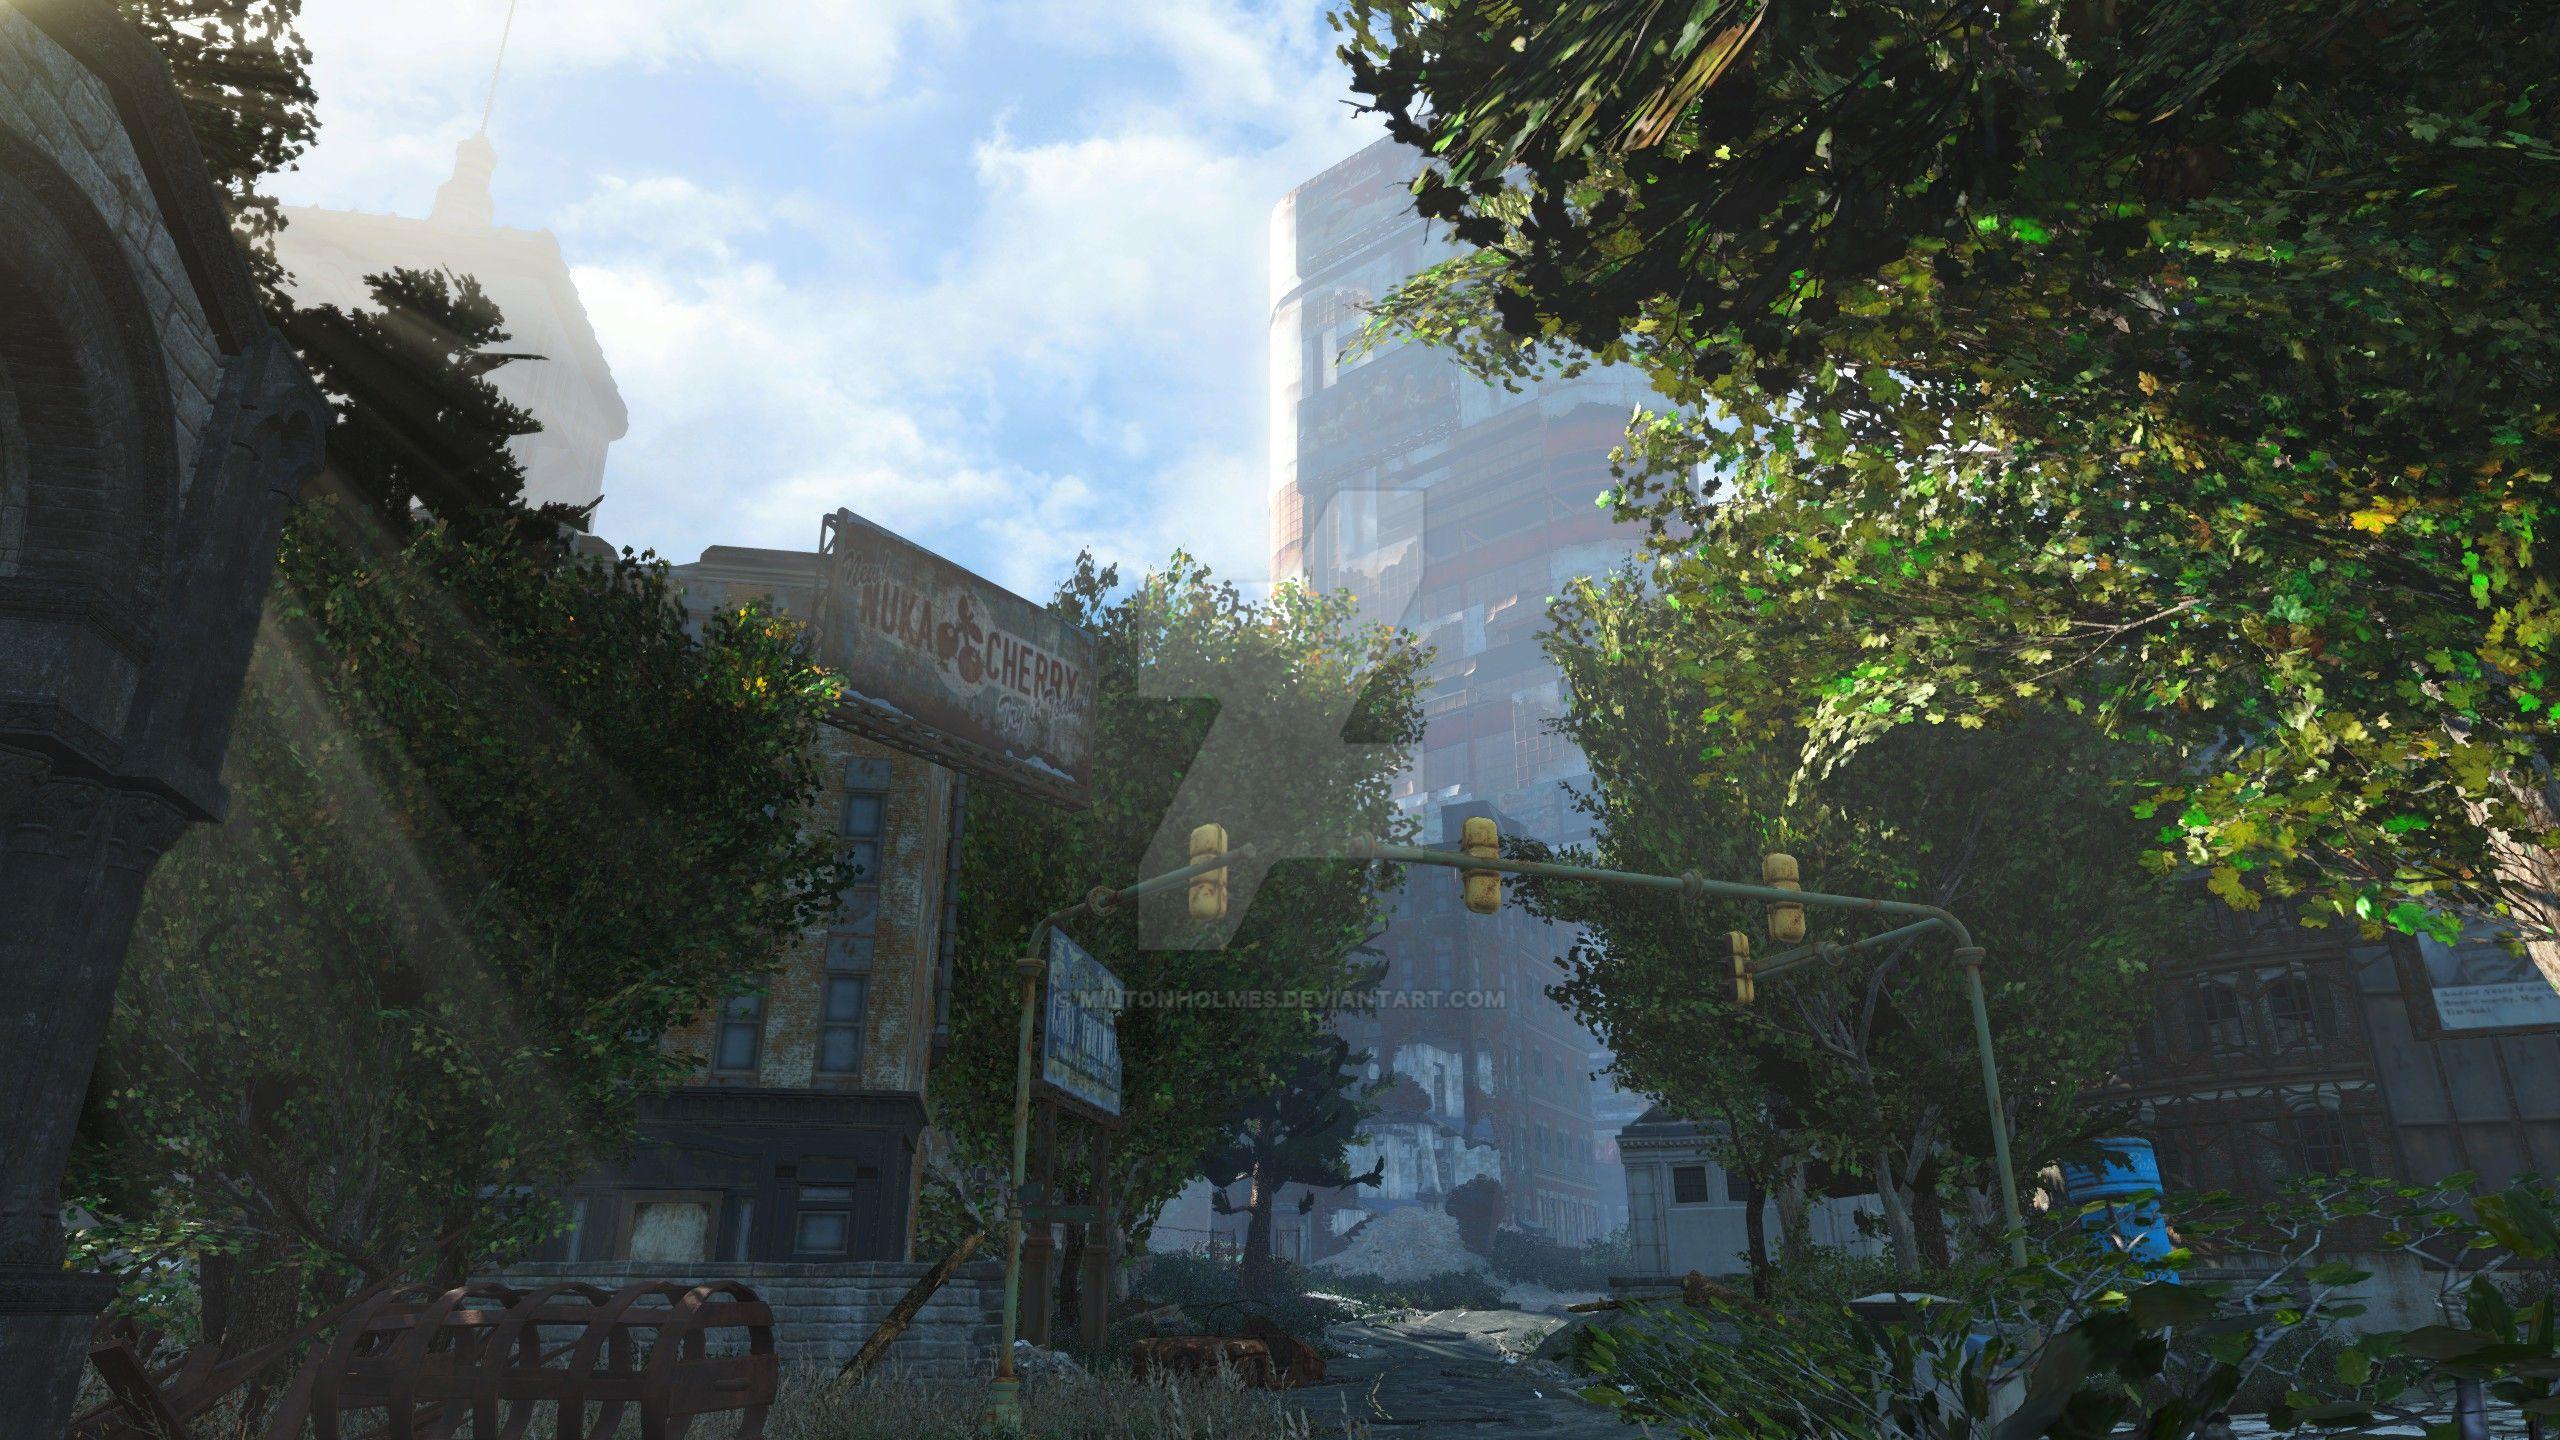 Trinity Plaza Regrowth by Miltonholmes